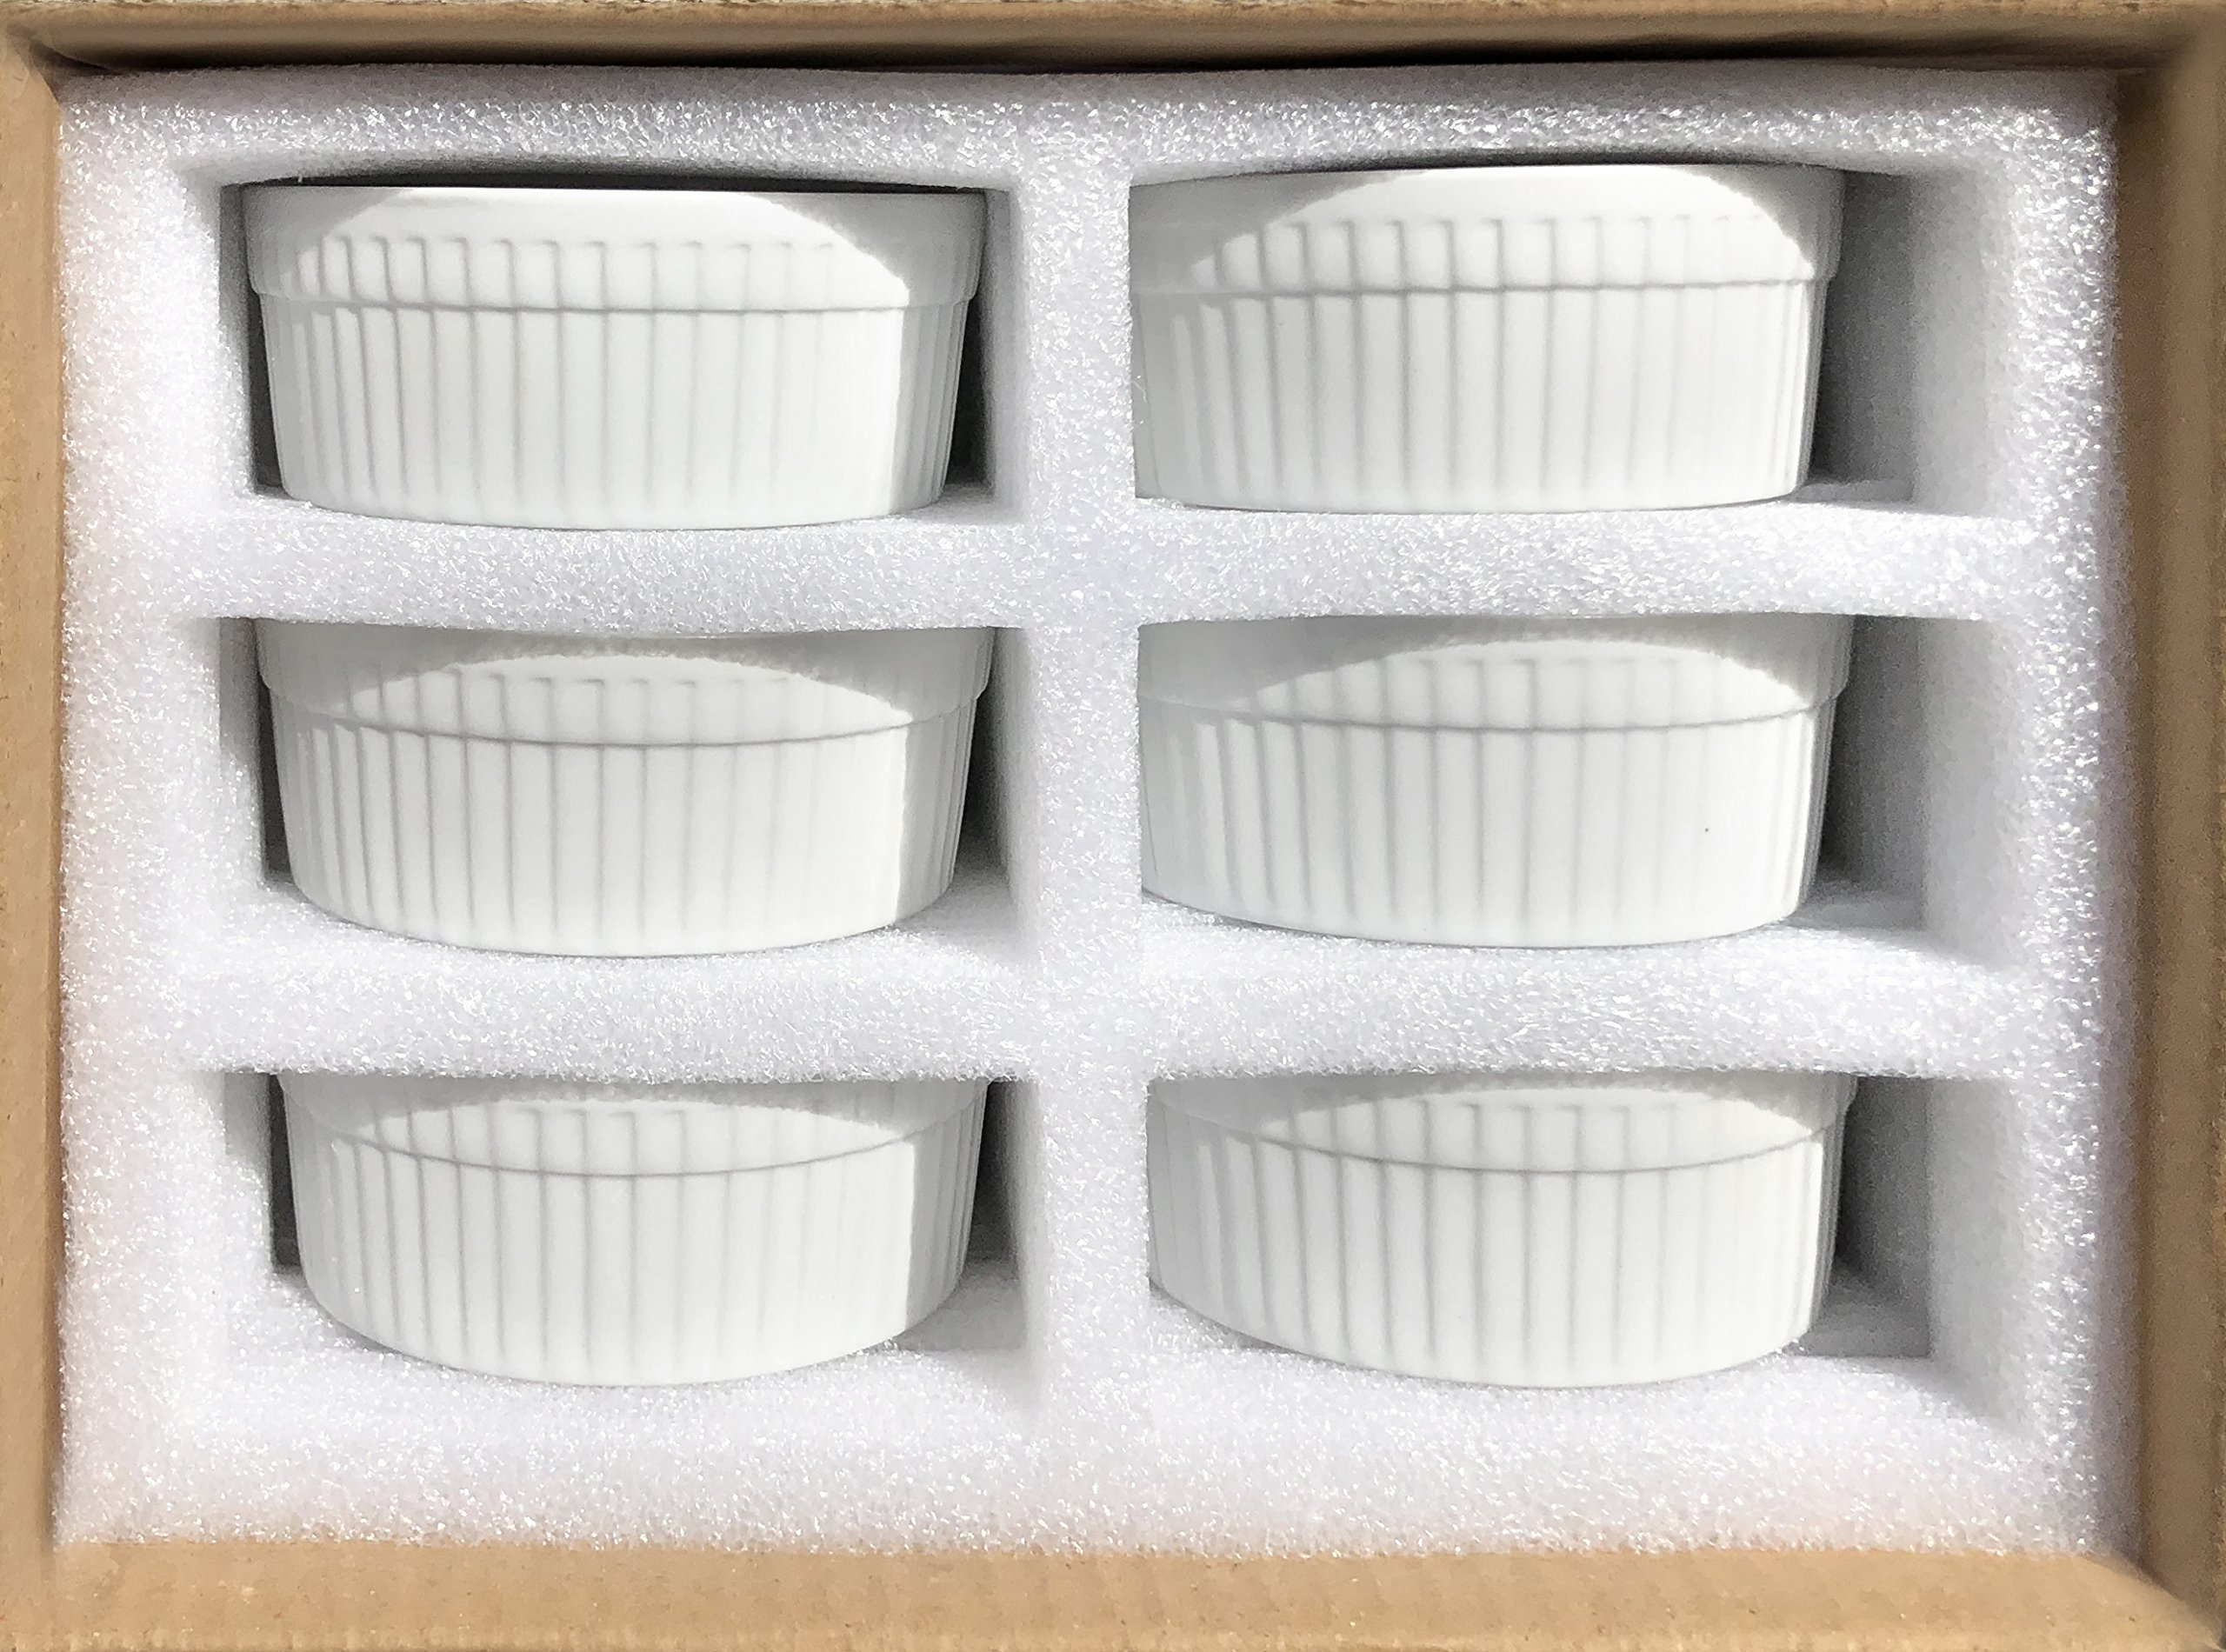 Furmaware White Porcelain 6oz Ramekins Set: 6-Piece Baking & Serving Individual Ramekin Bowls  Sturdy & Classy No Odor & Easy To Clean Ramekin Cups  Decorative Soufflé, Sauce, Dressing & Dip Ramekins